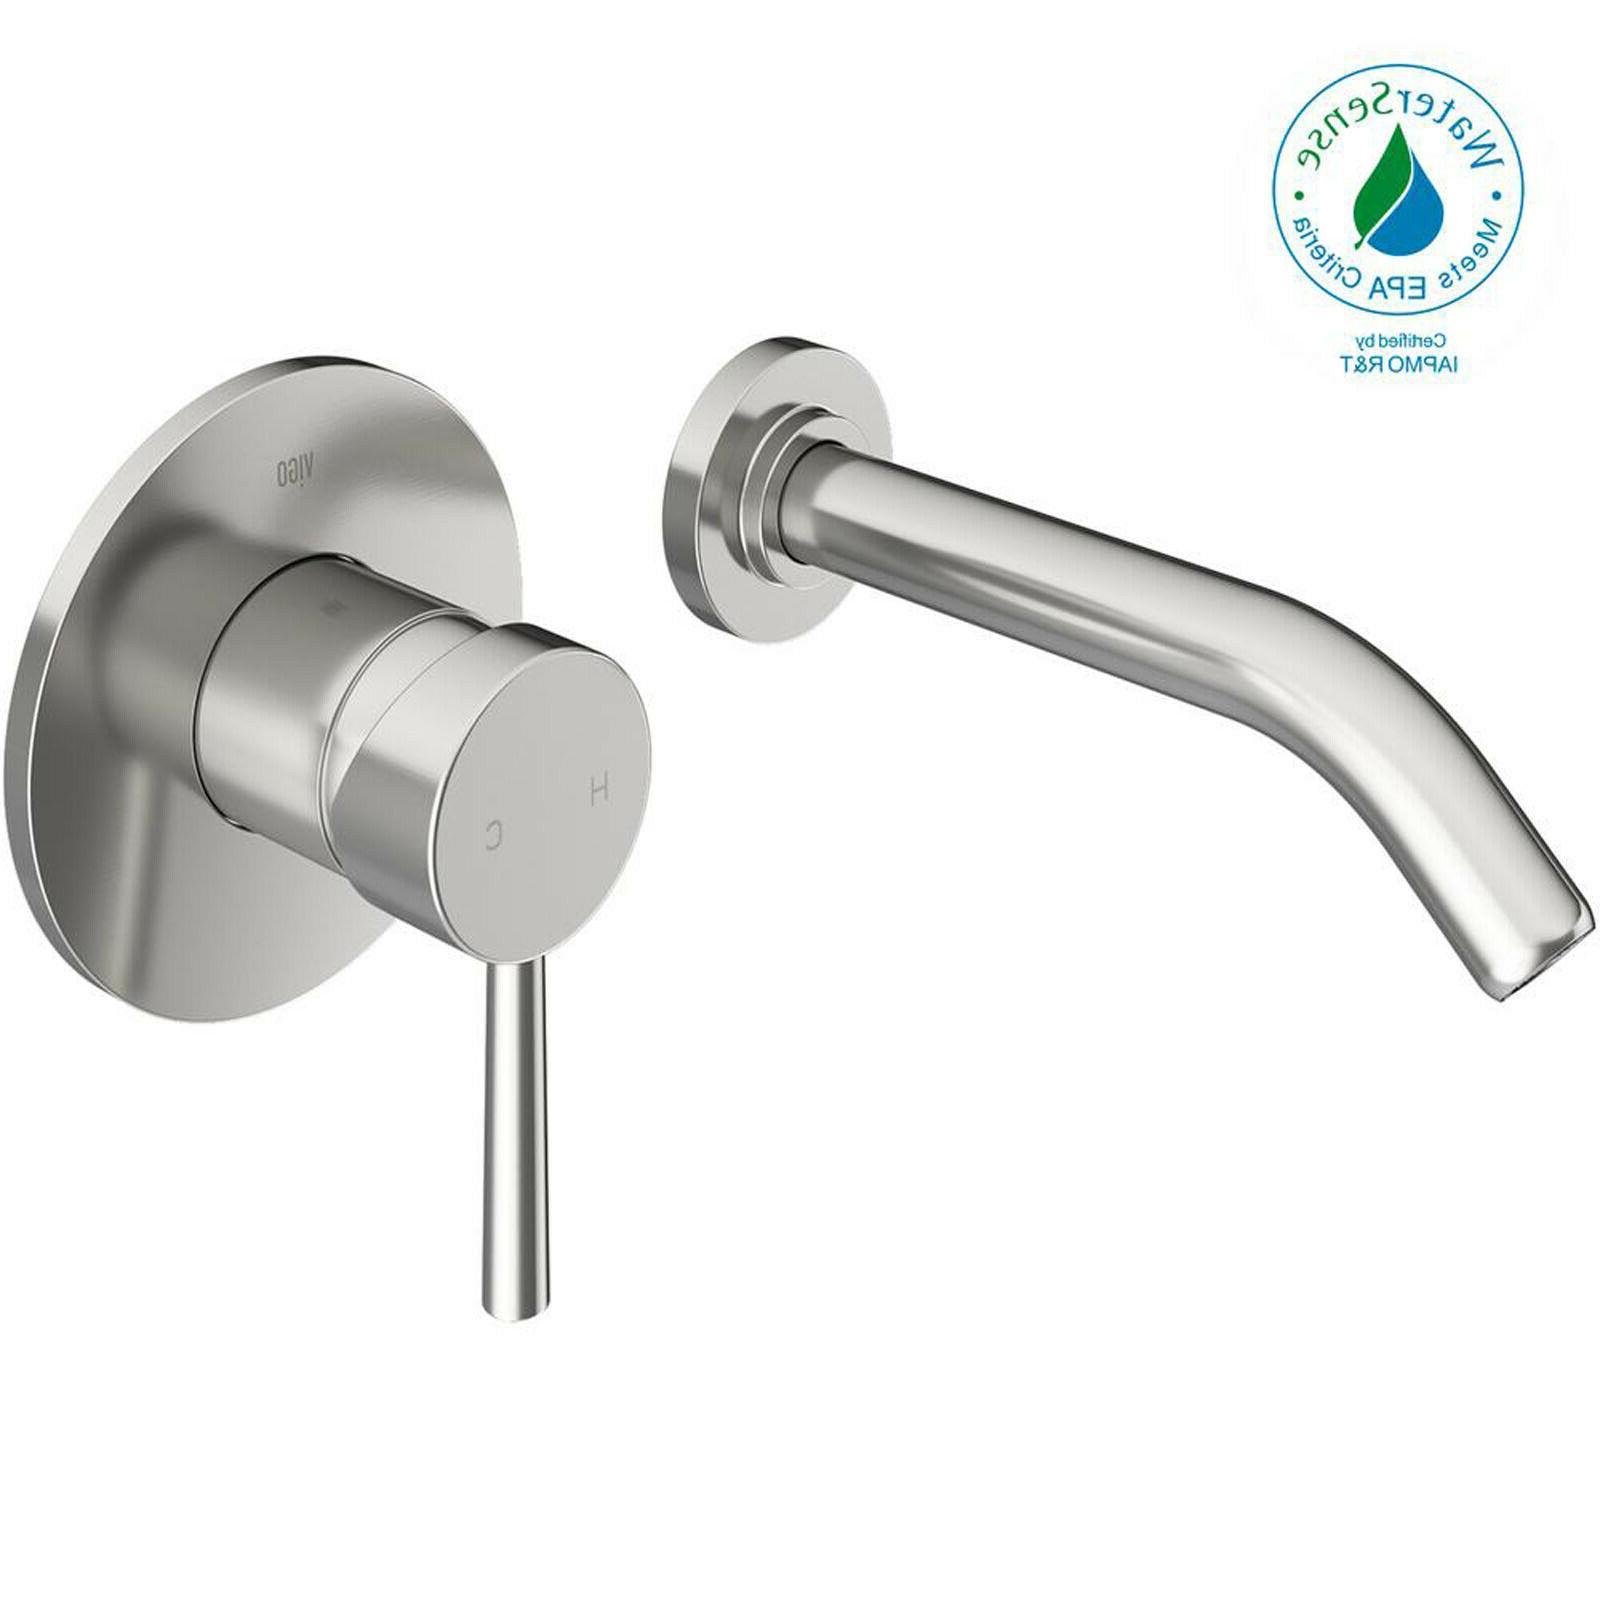 olus wall mount bathroom faucet